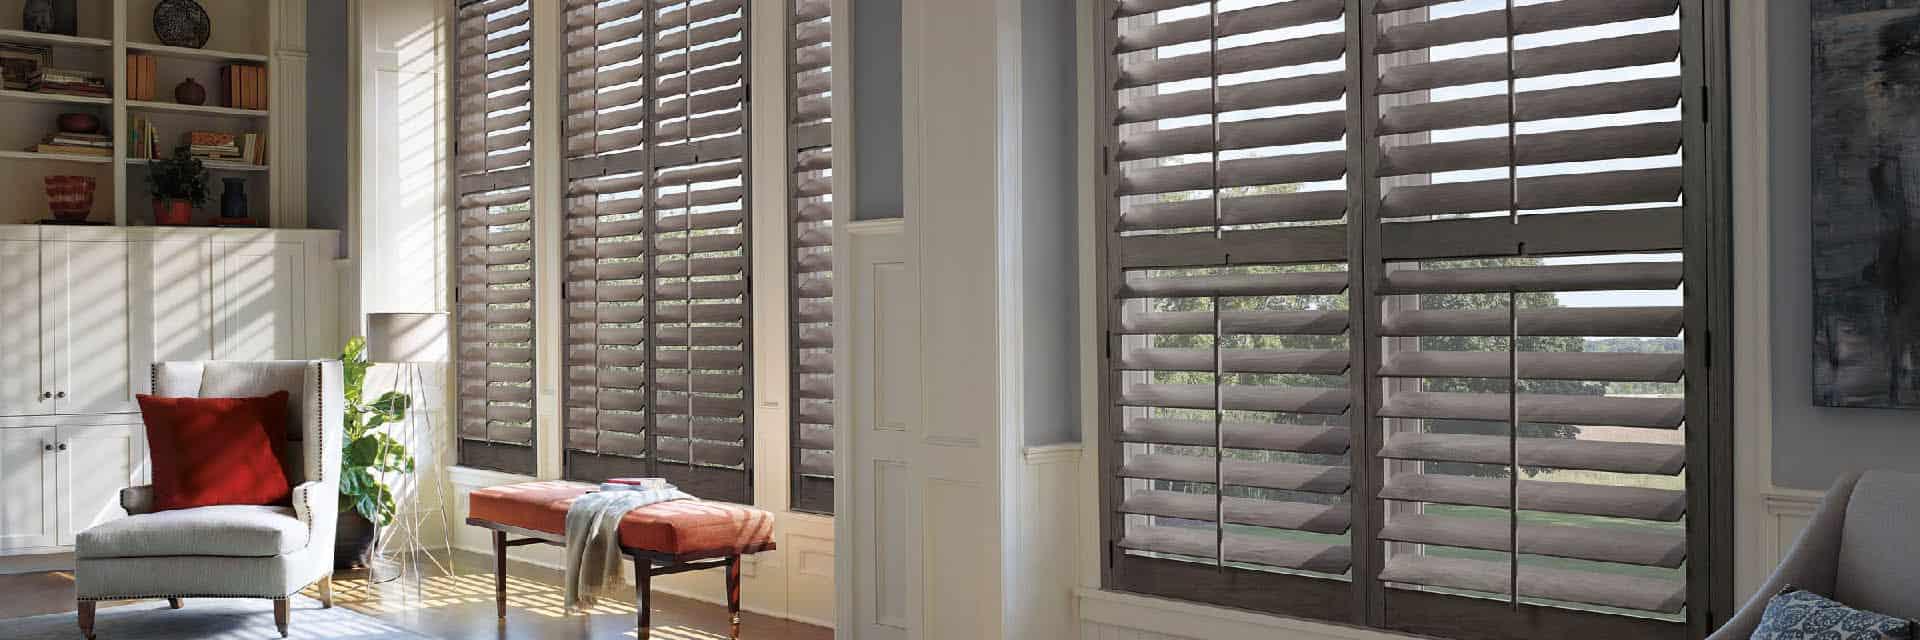 Wood Shutters Ruffell Brown Window Fashions